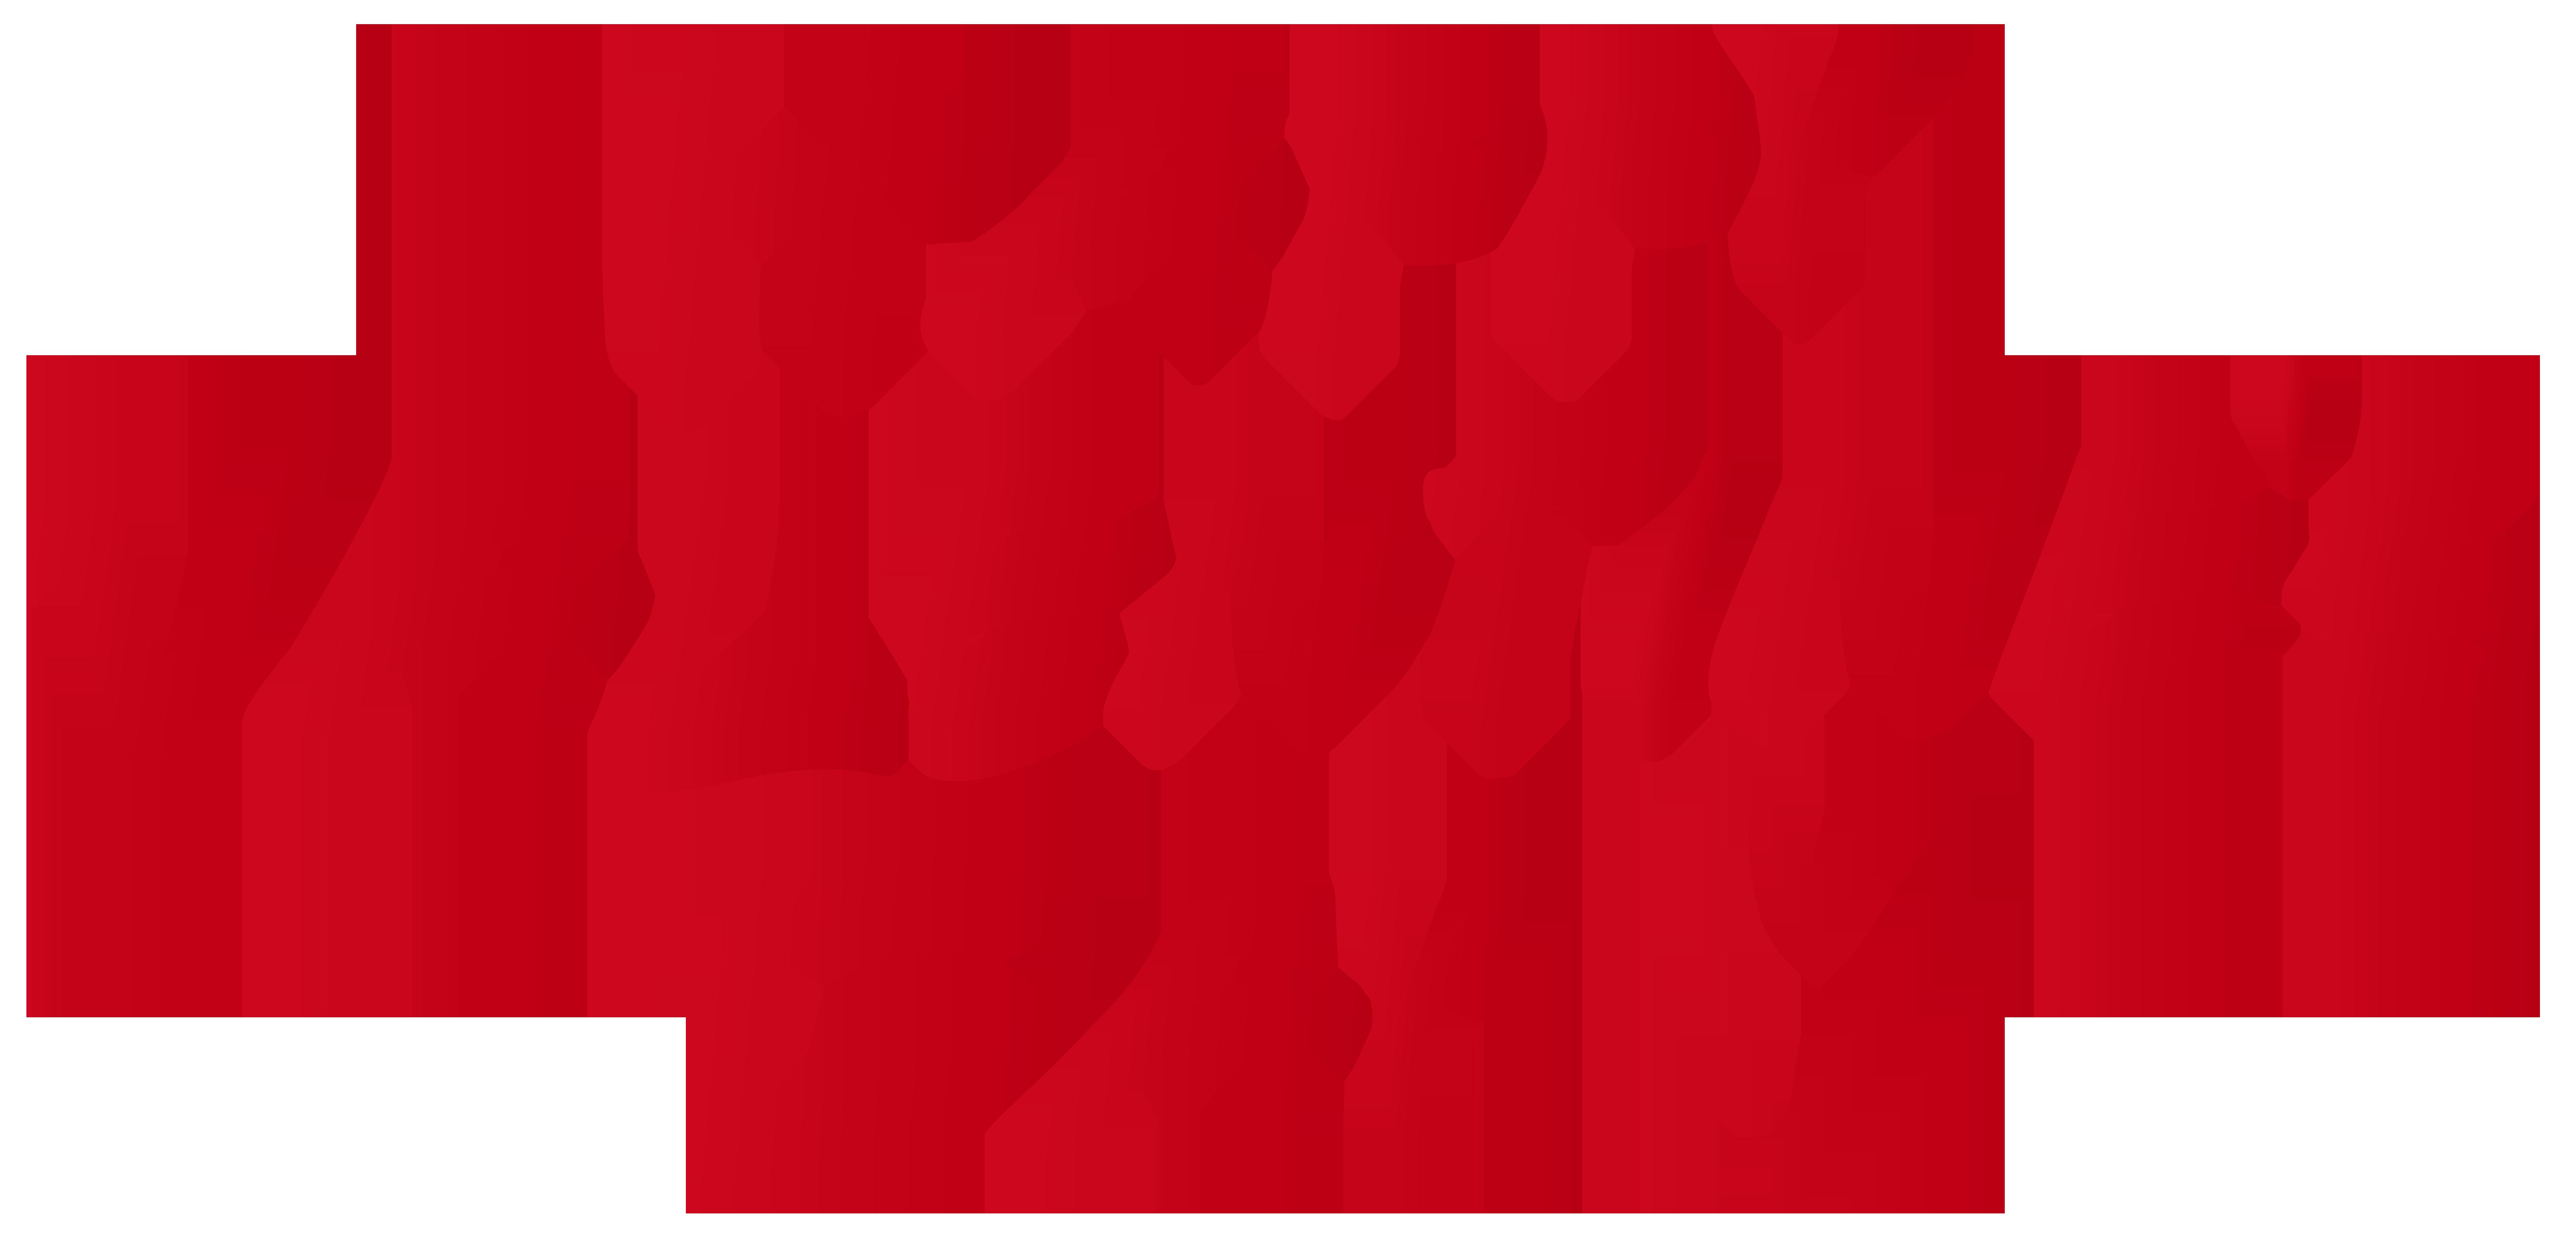 8000x3835 Happy Valentine's Day Png Clip Art Imageu200b Gallery Yopriceville